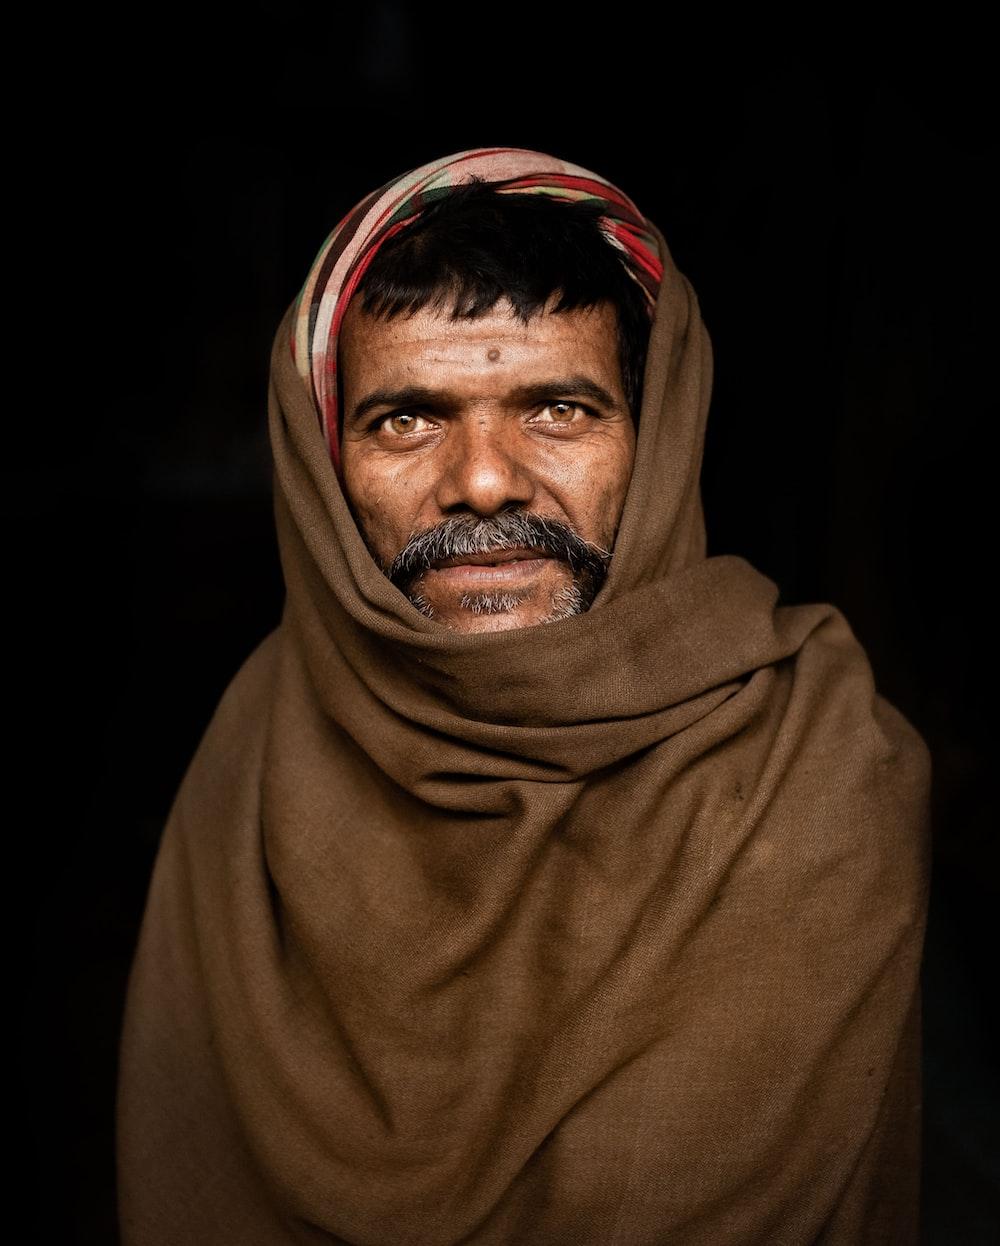 portrait of man wearing black hijab